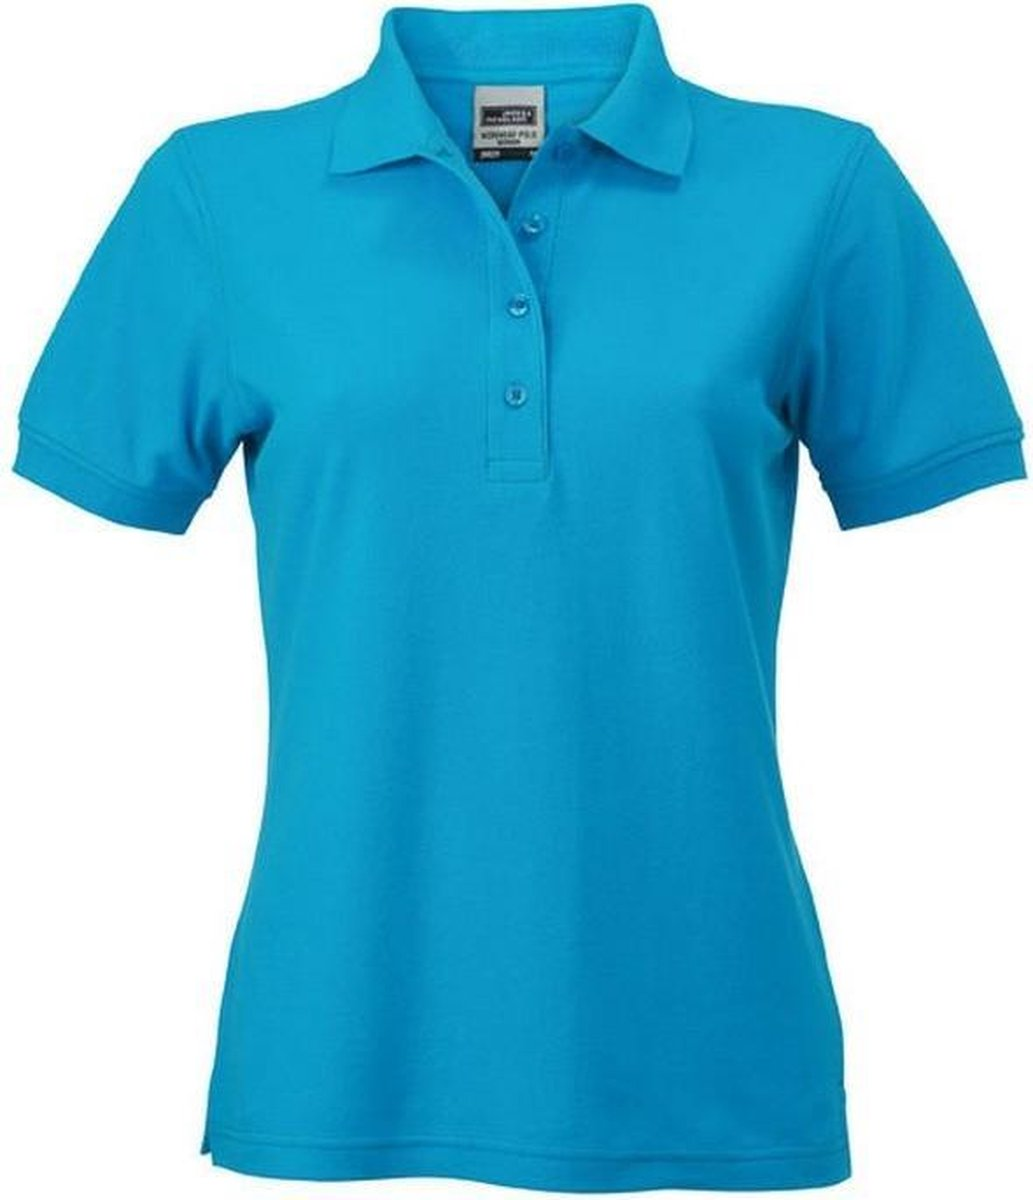 James and Nicholson Dames/dames Werkkleding Poloshirt (Turquoise)